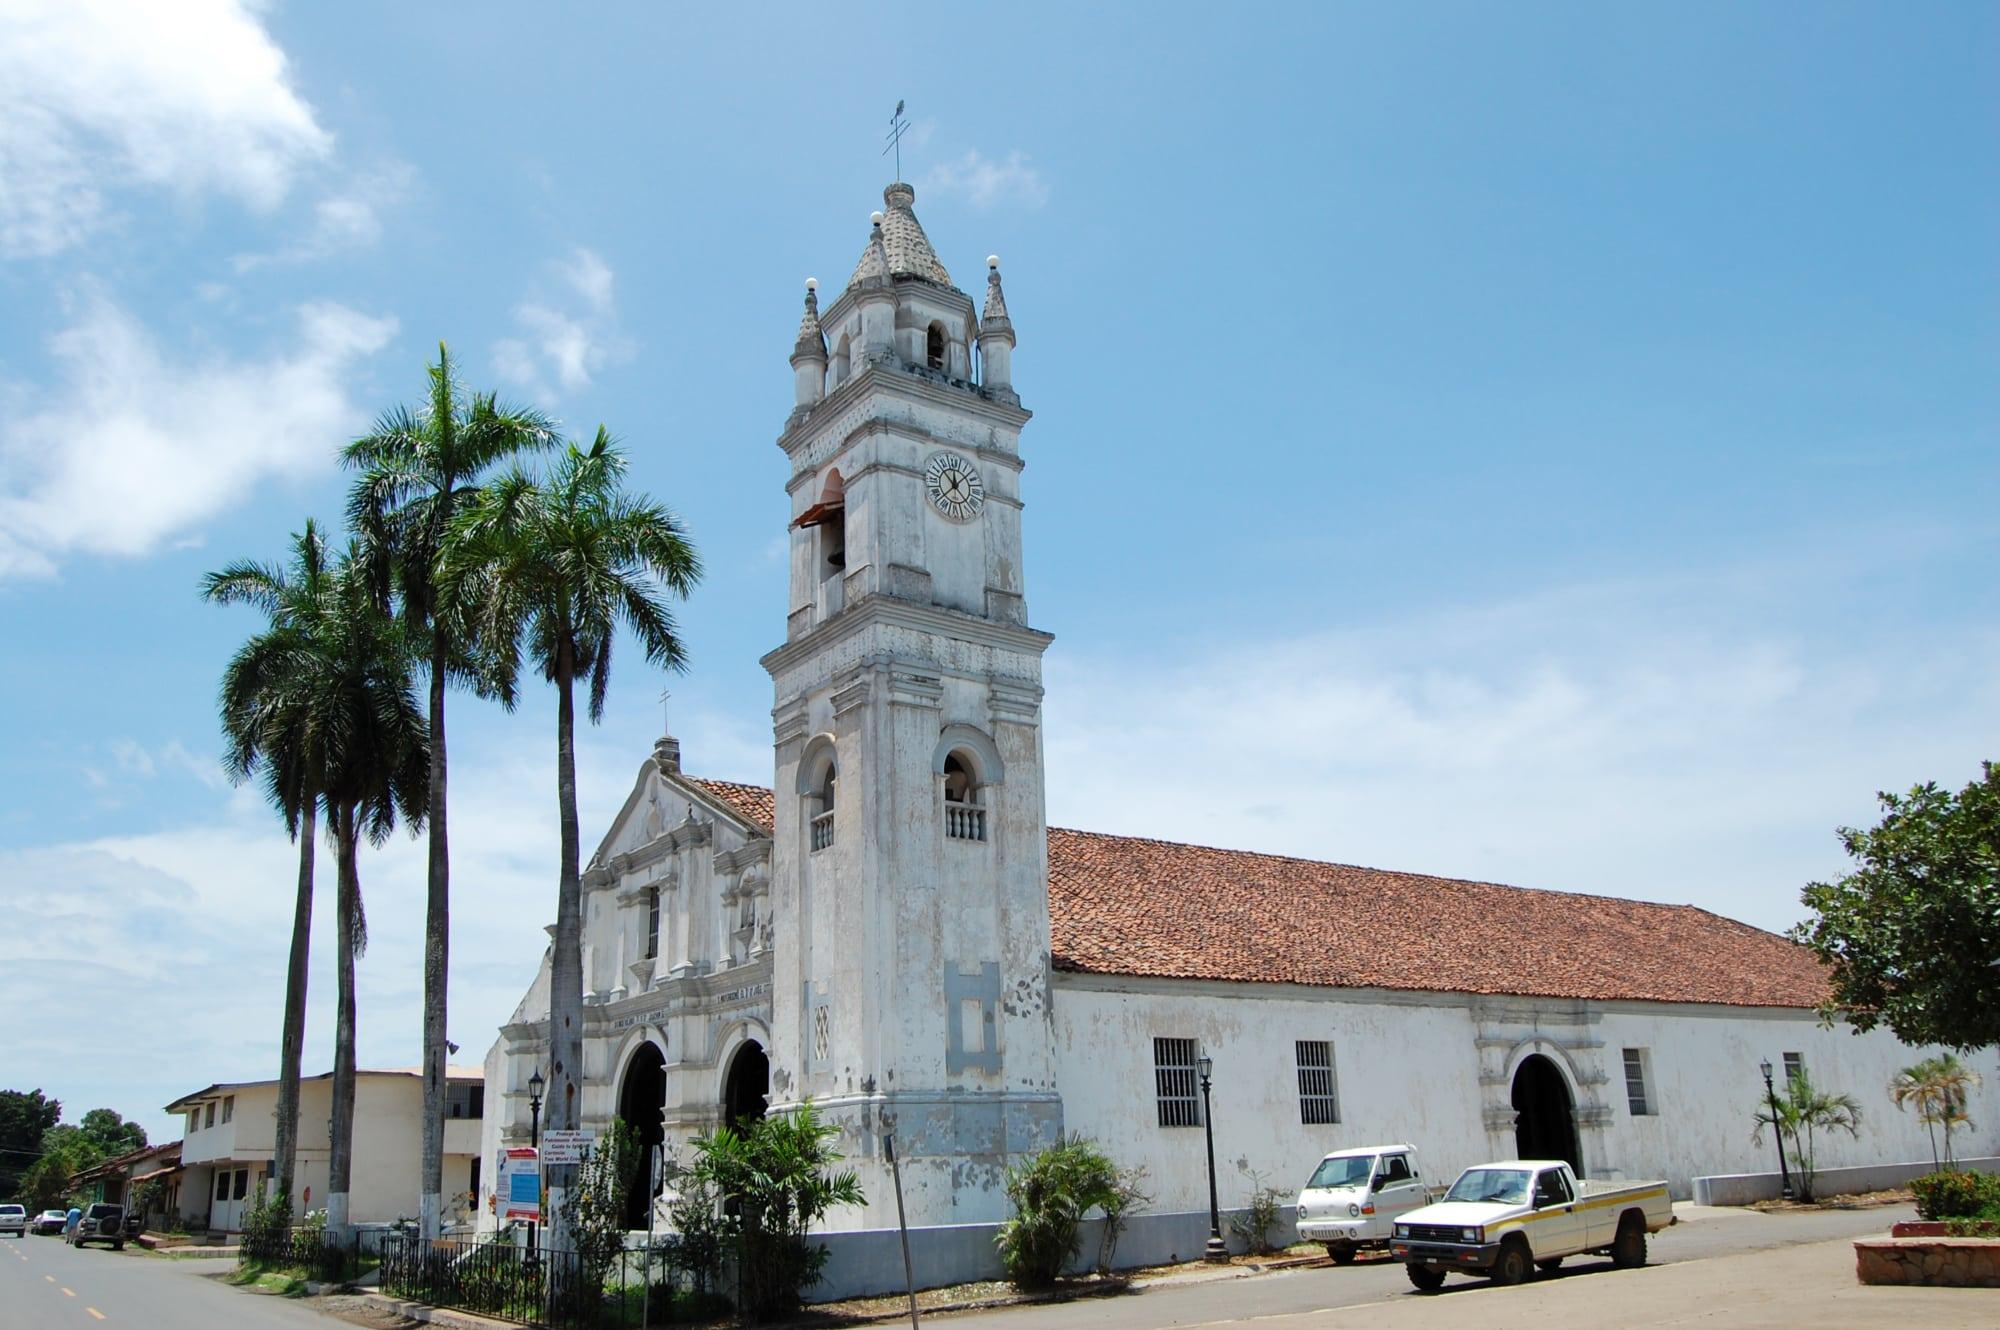 Kirche im Kolonialstil in Azuero, Panama